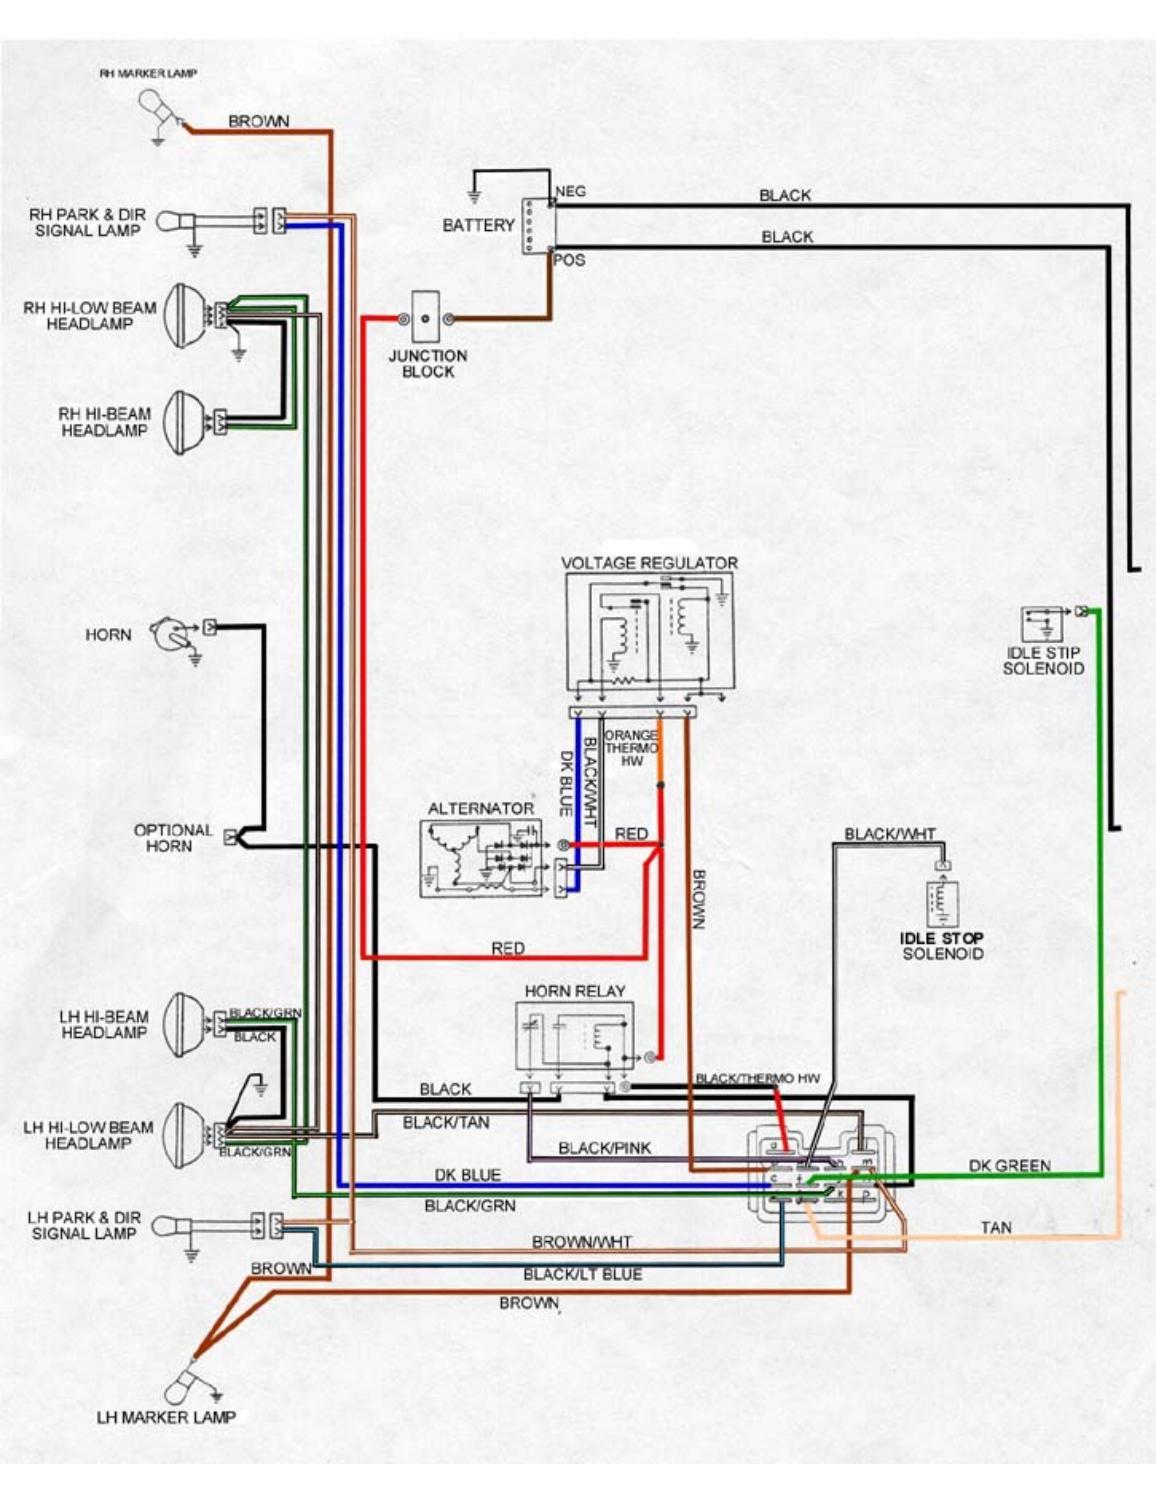 Pontiac Firebird Wiring Diagrams 67 68 69 Models by heydownloads - issuuIssuu